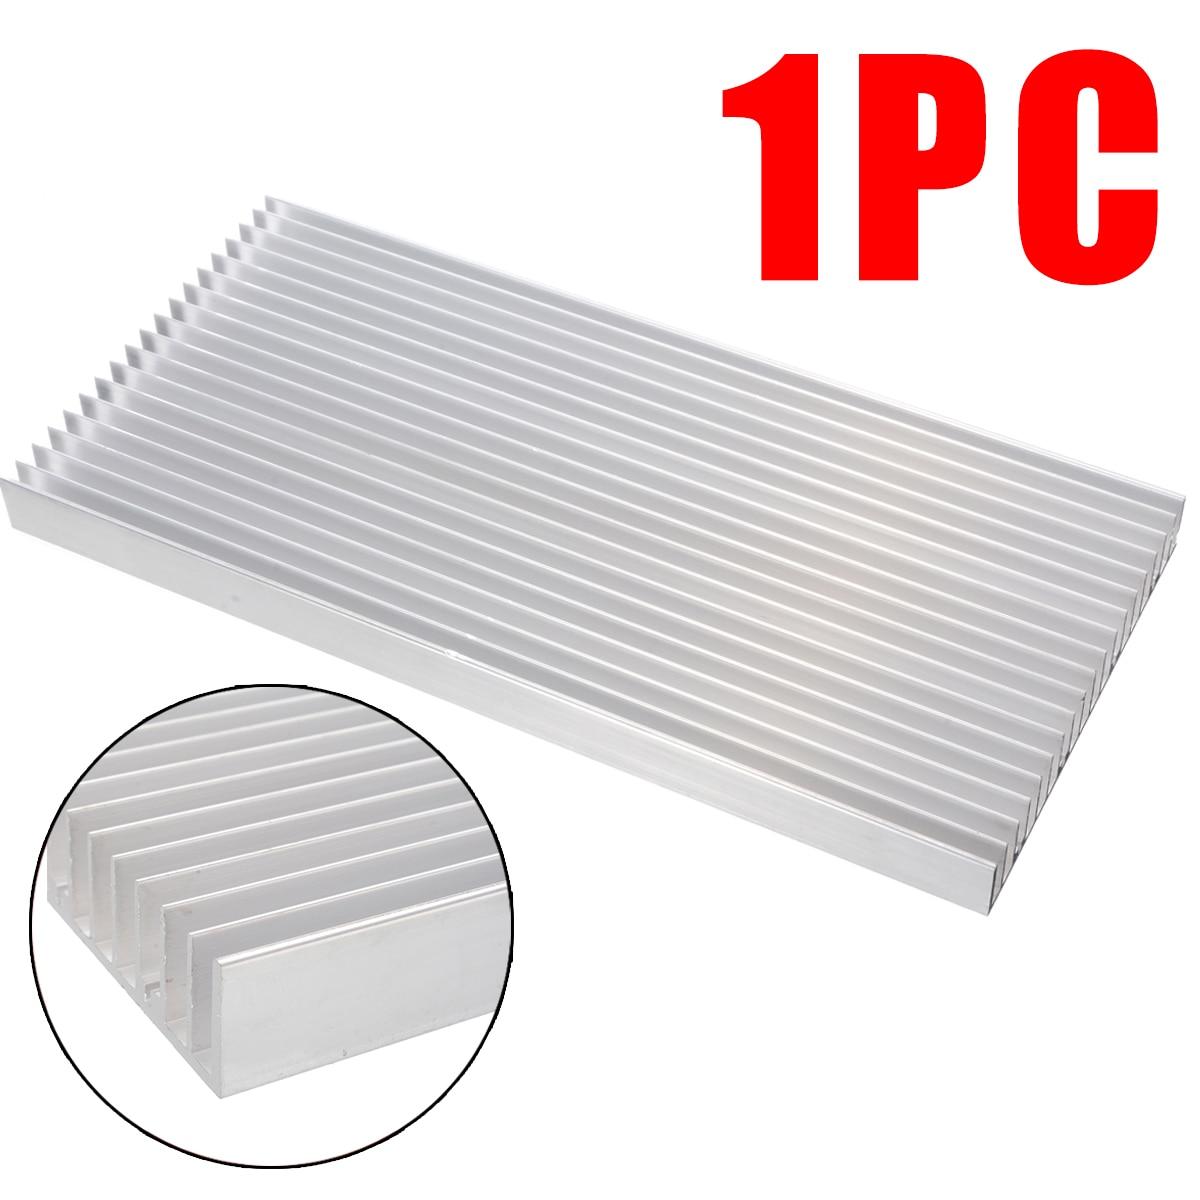 30014020MM Cooling Heatsink 1pc LED Heat Sink Cooling Fin Aluminum Heat Sink